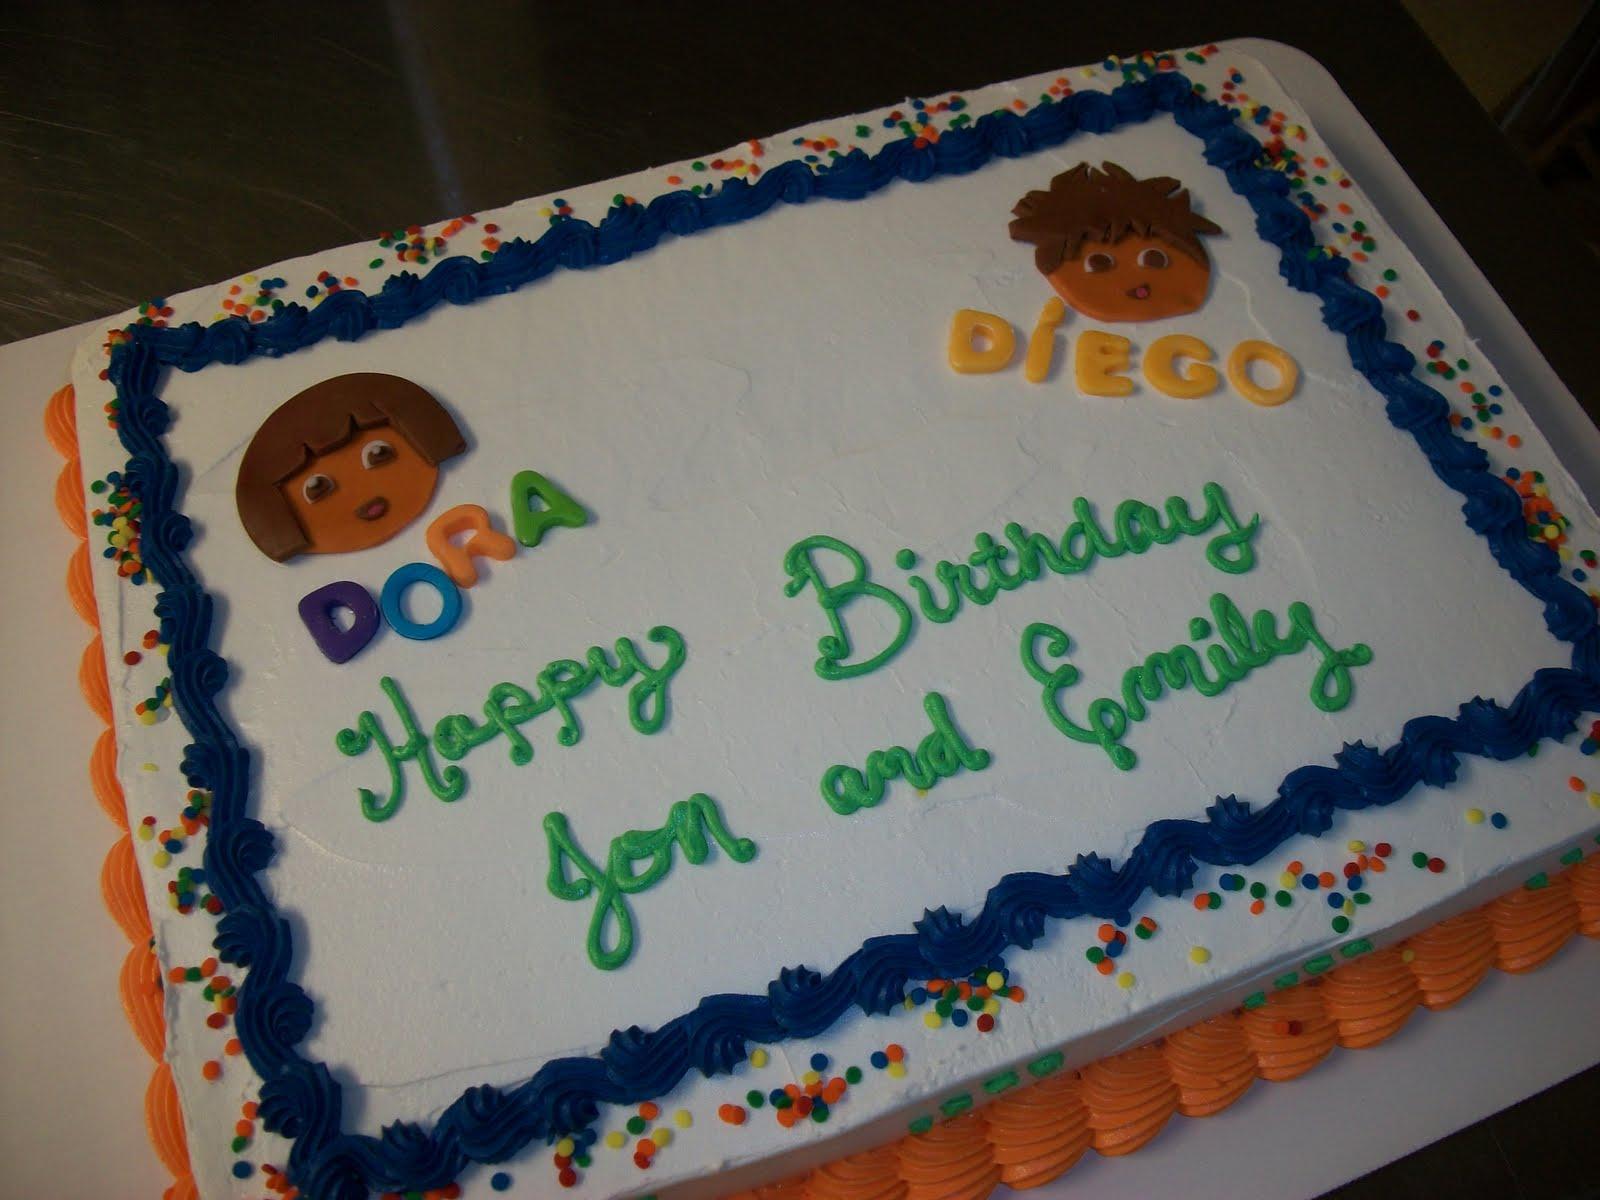 Kroger Sheet Cake Designs : Pin Dora And Diego 2nd Birthday   Cake Photos Cake on ...